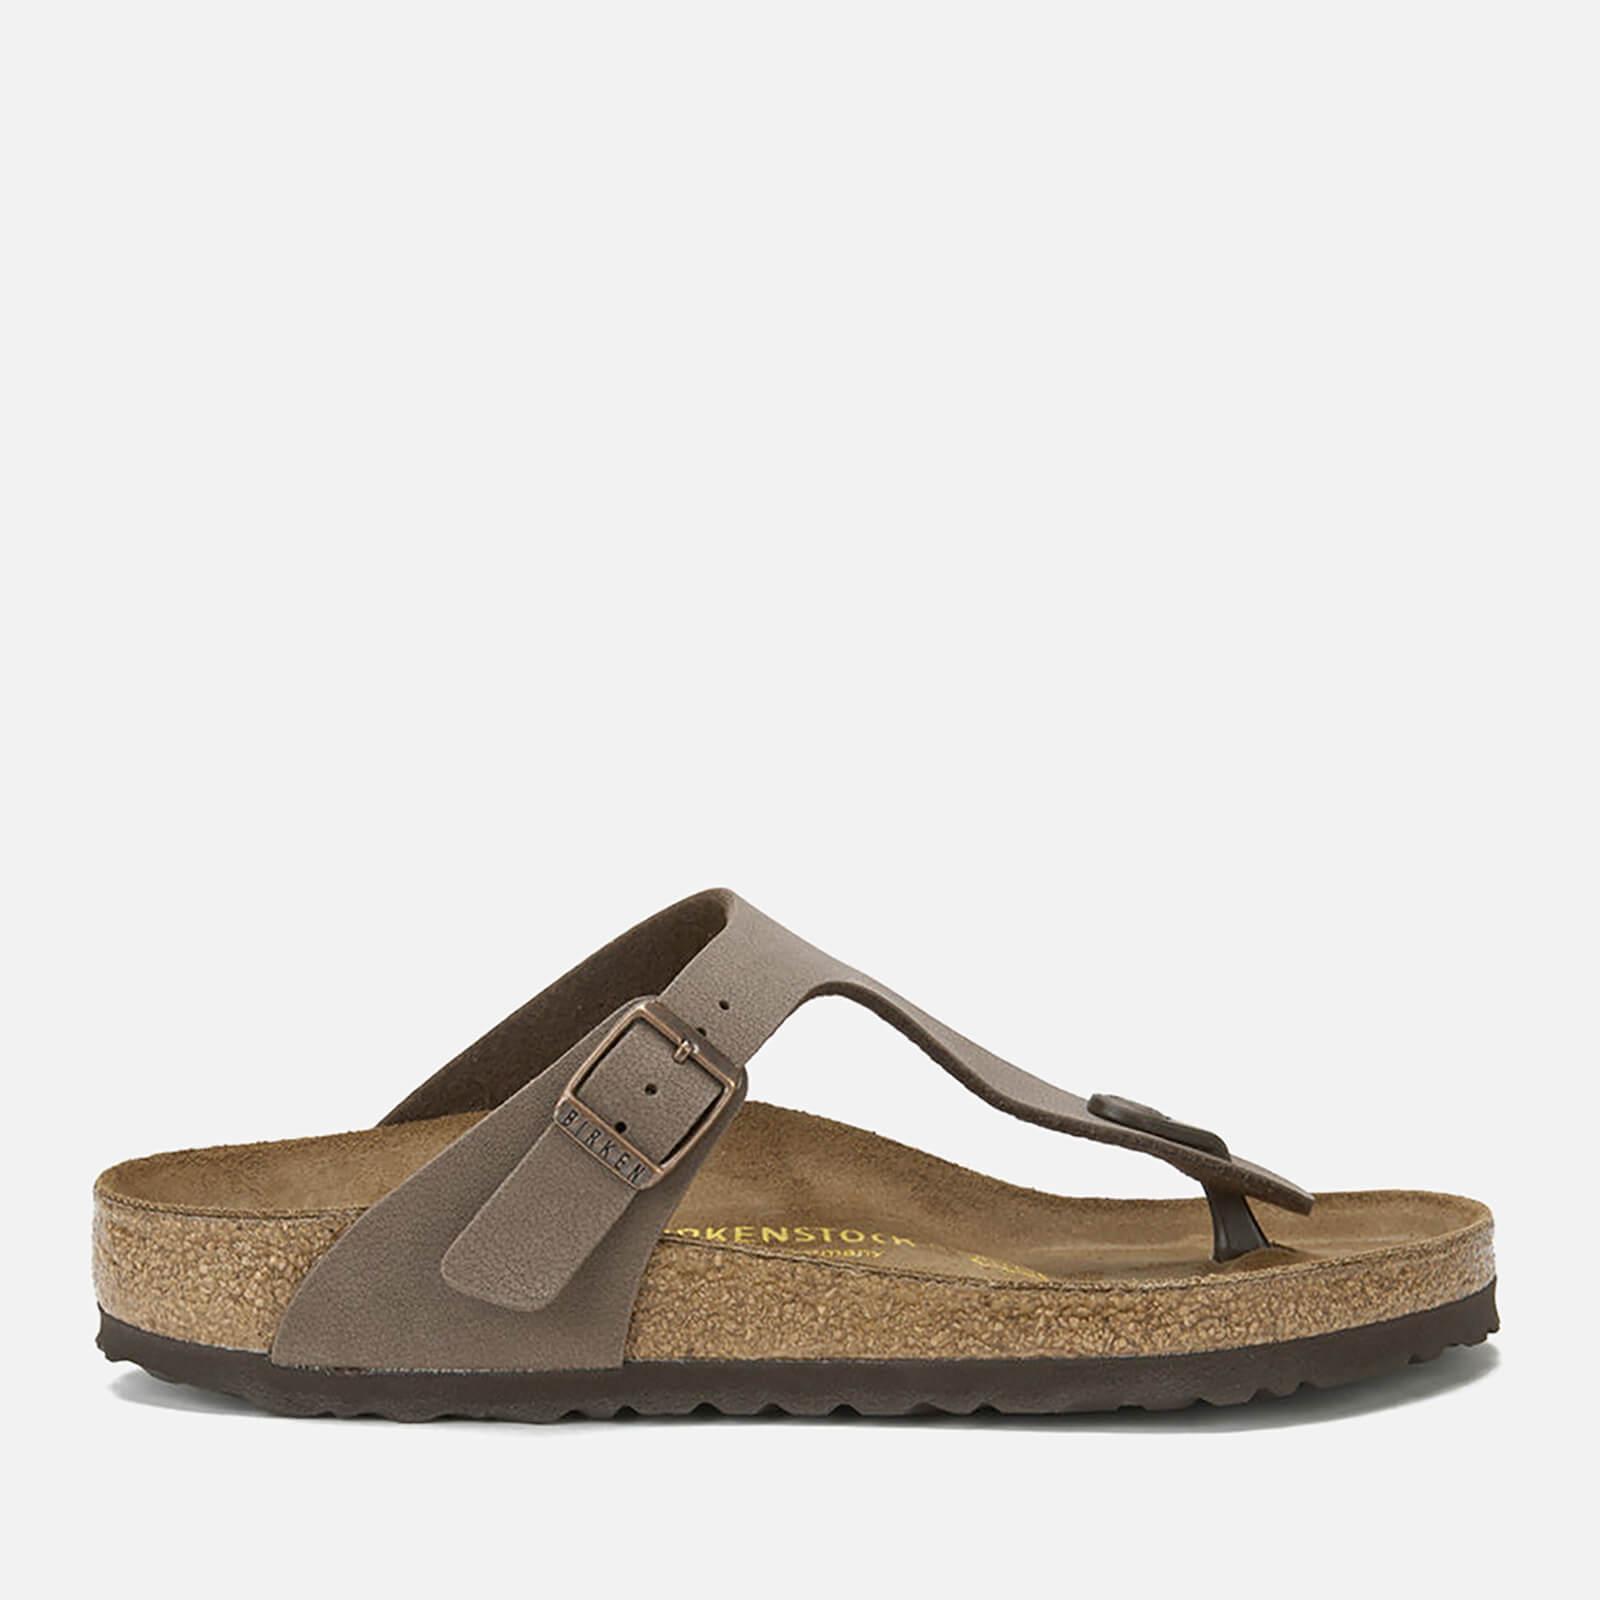 Birkenstock Women's Gizeh Toe-Post Sandals - Mocha - EU 37/UK 4.5